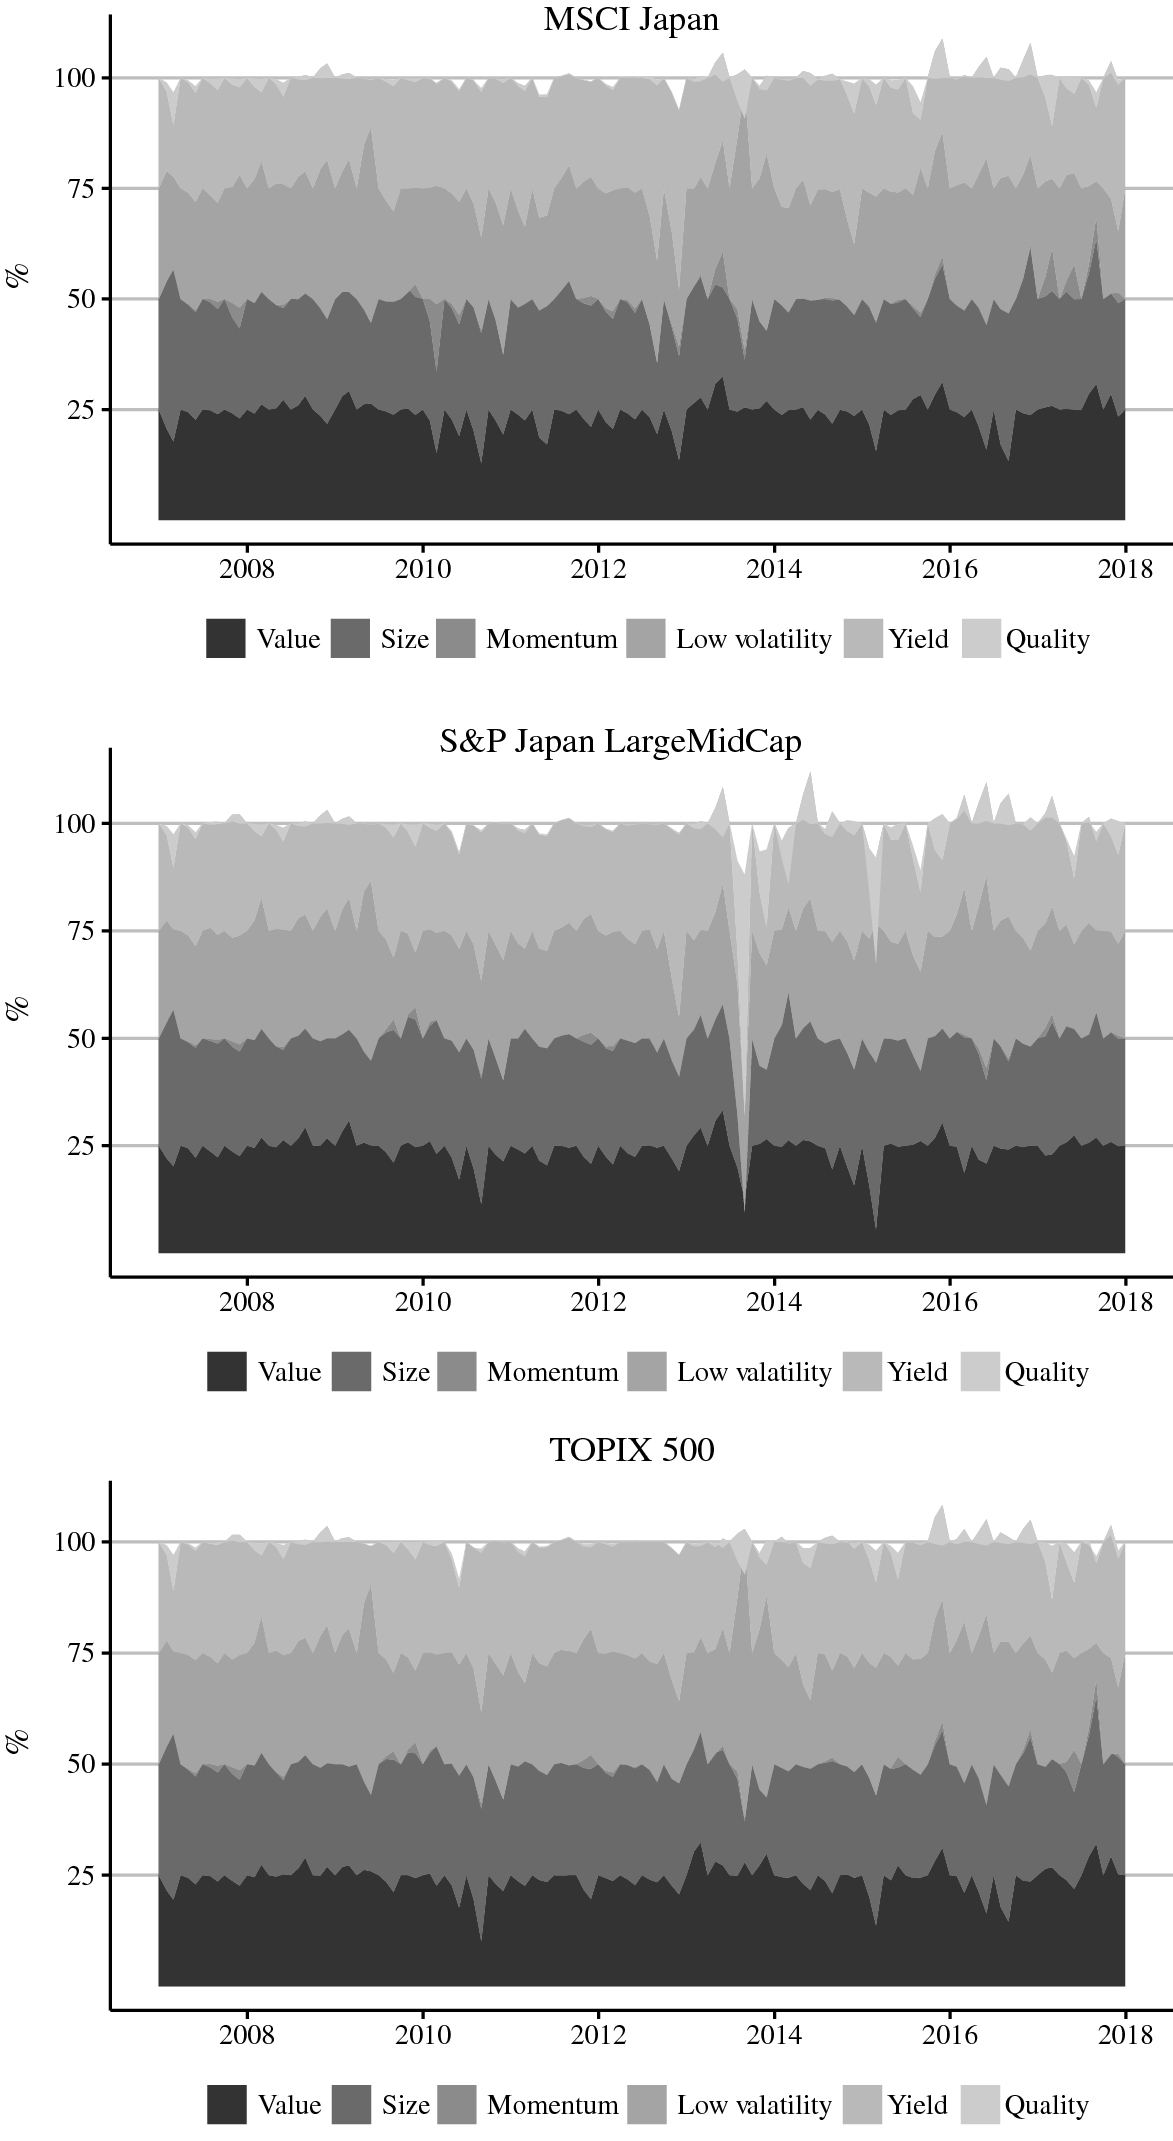 Multifactor Portfolio Construction by Factor Risk Parity